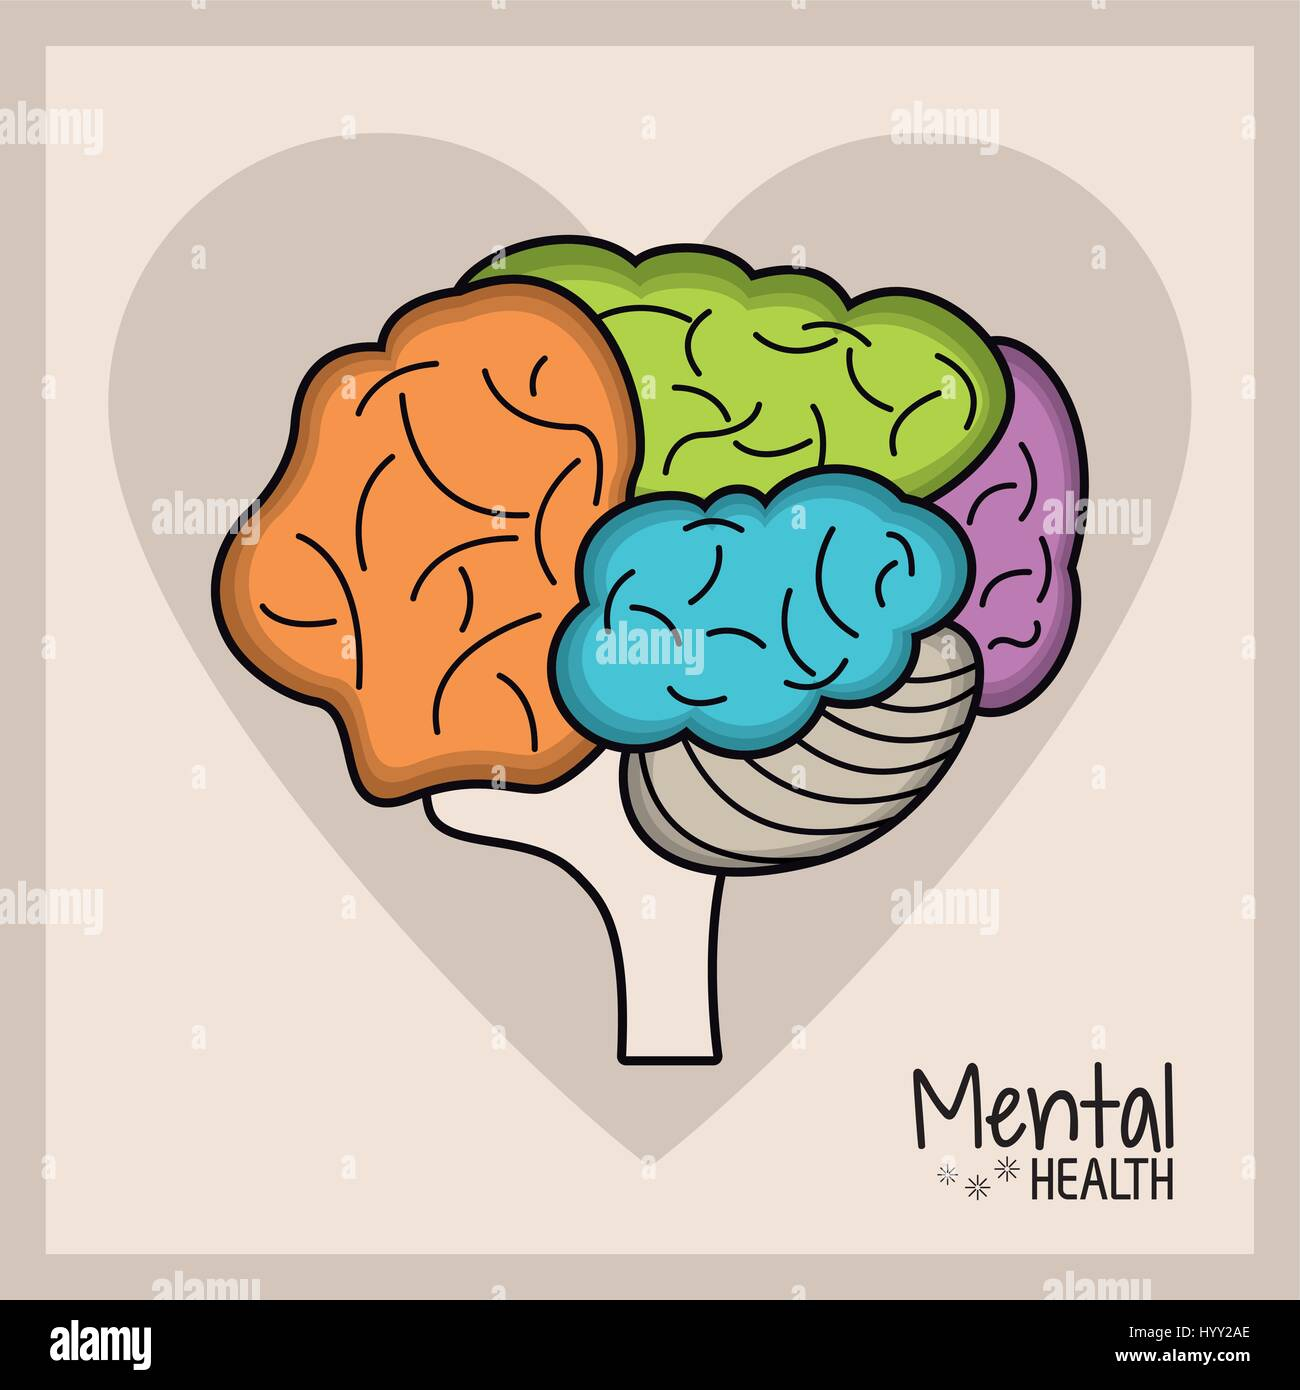 mental health brain heart - Stock Image